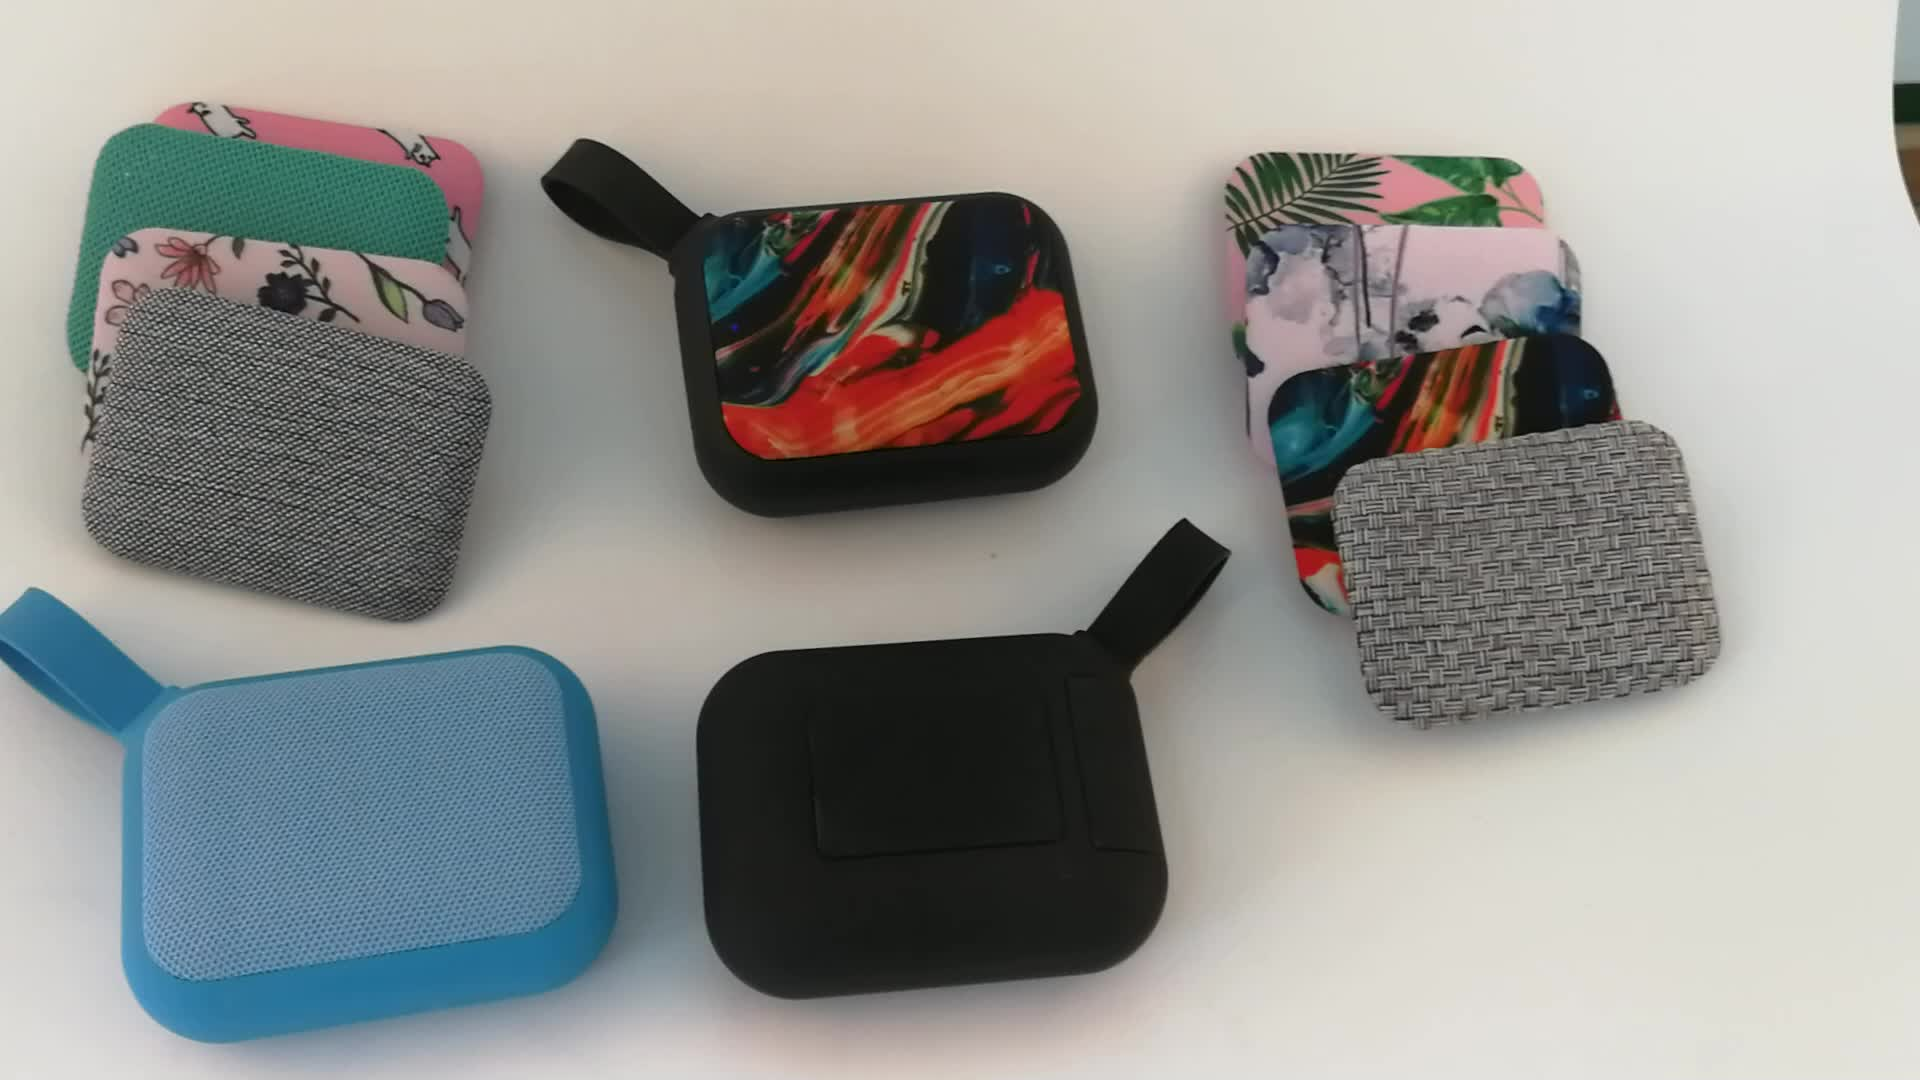 2017 di vendita caldo mini portatile stereo senza fili ricaricabile tessuto alarm clock speaker radio fm